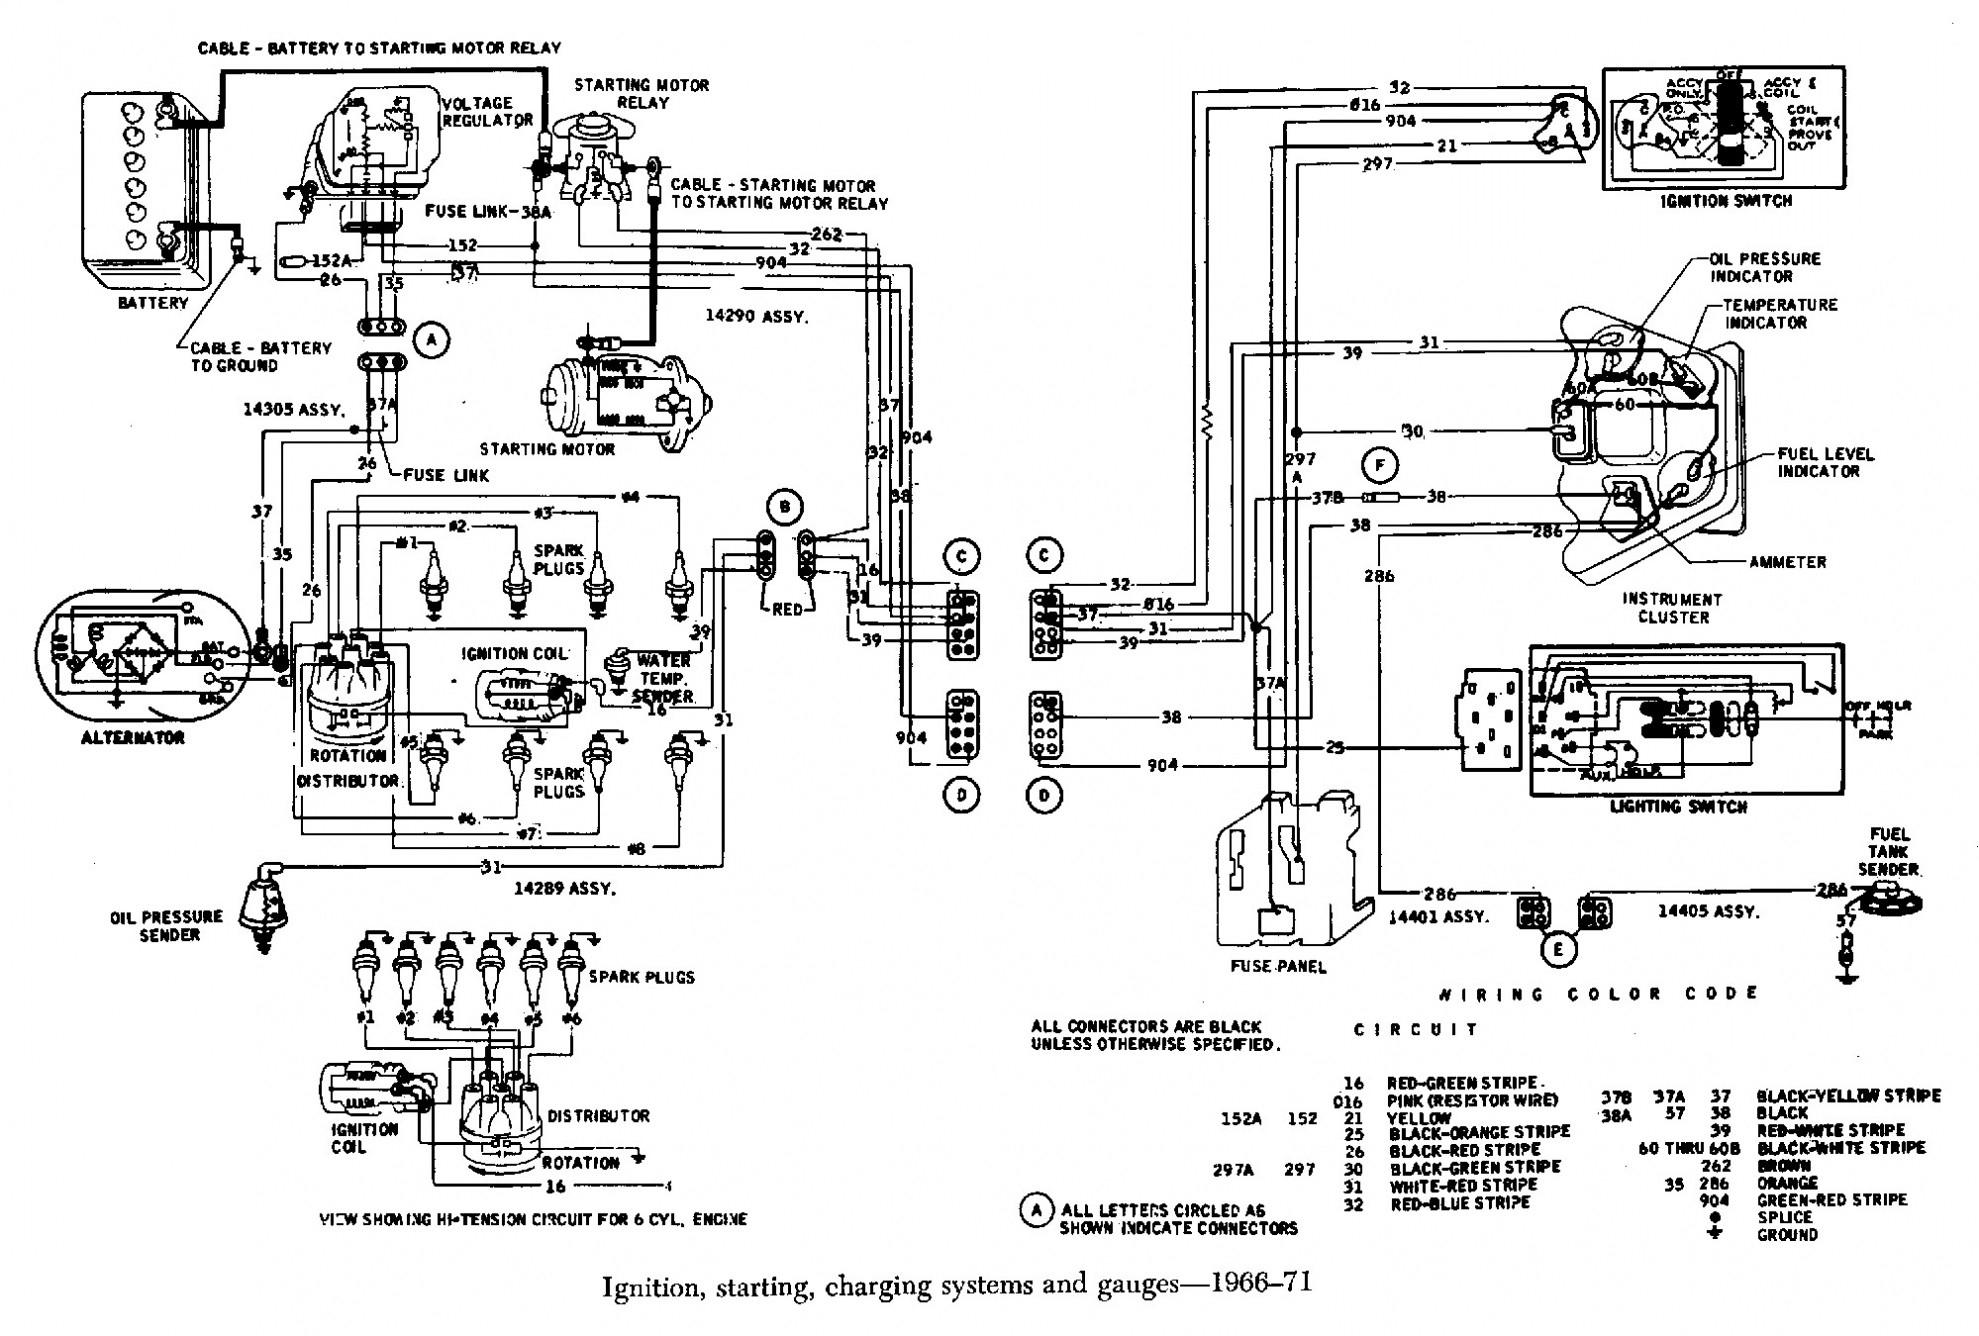 50 Amp Twist Lock Plug Wiring Diagram